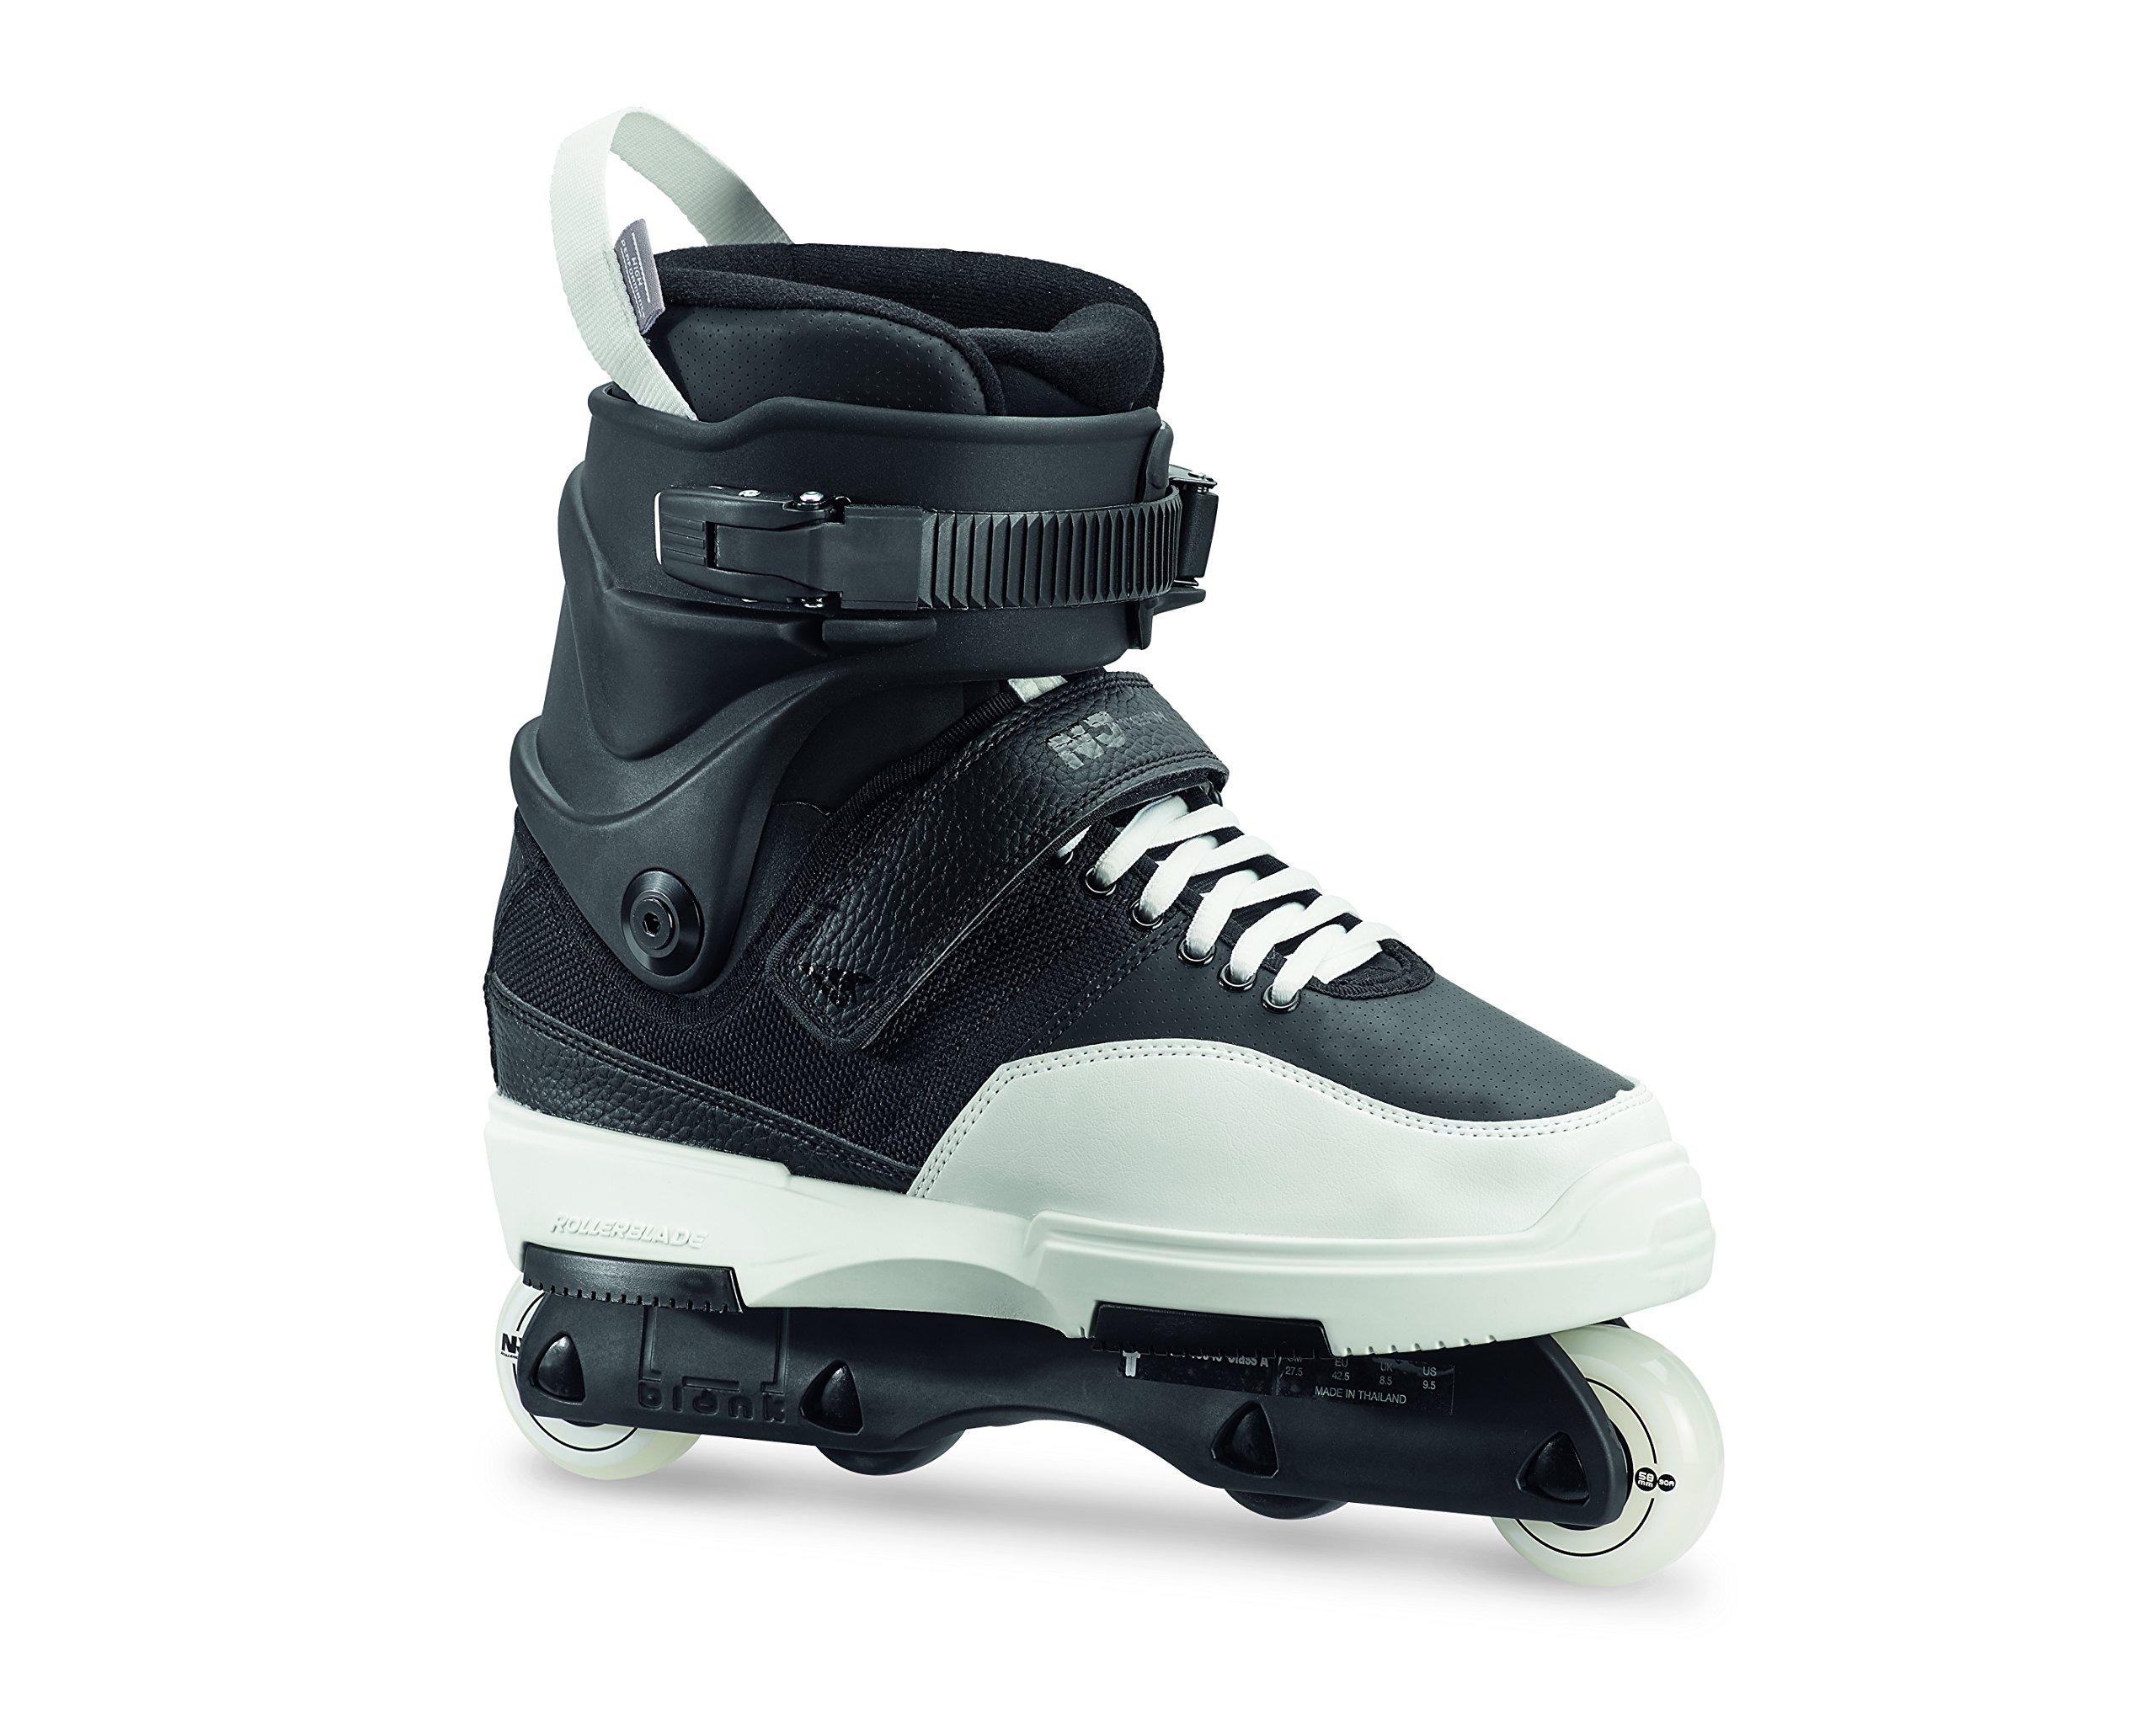 Rollerblade Men's Nj Team Street Inline Skate, Black/White, Size 6